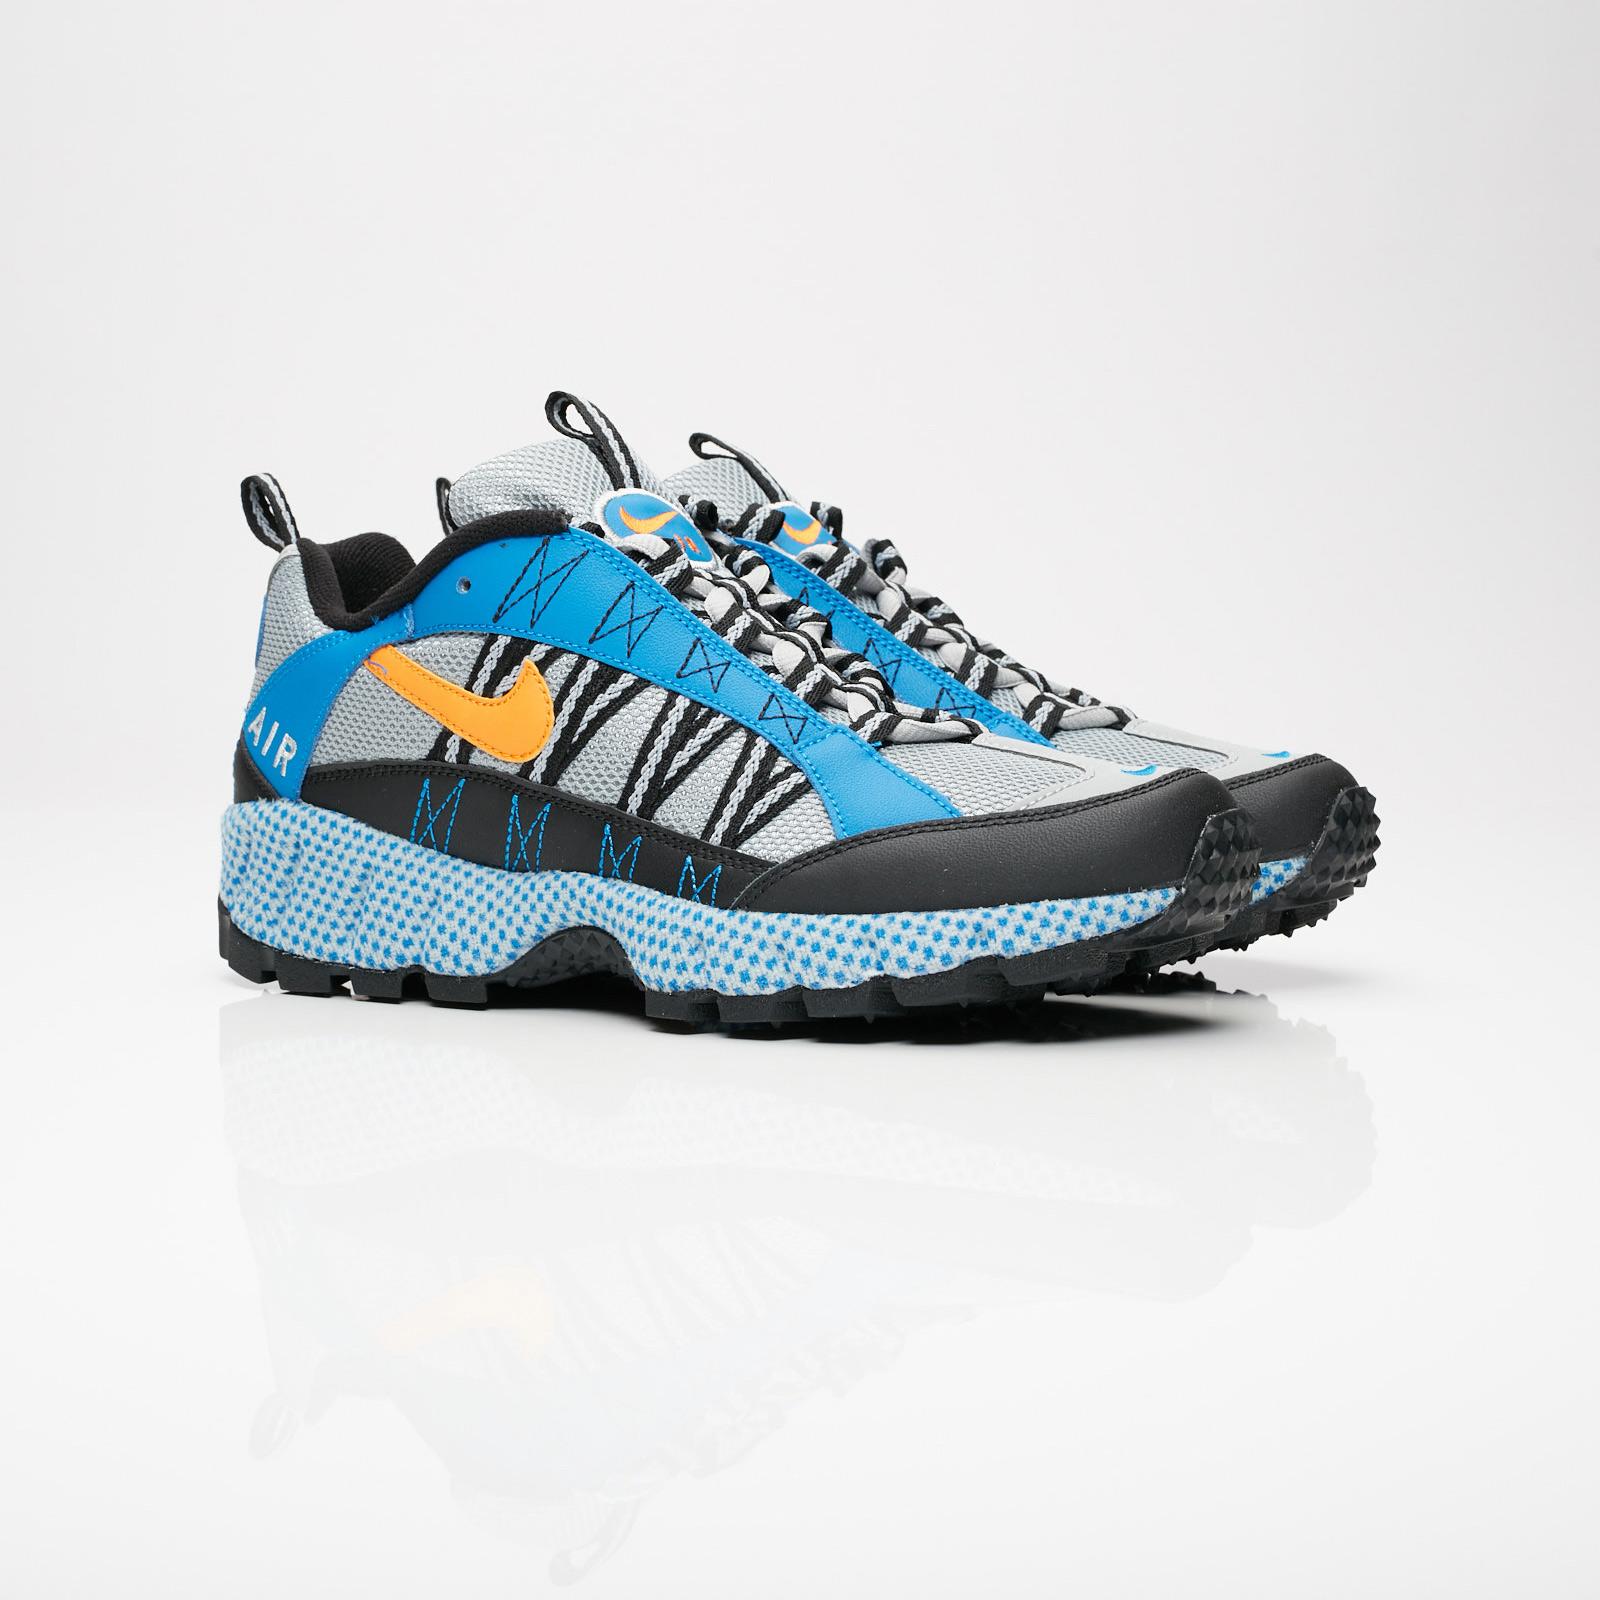 0140fa7fa4dc Nike Air Humara 17 QS - Ao3297-001 - Sneakersnstuff